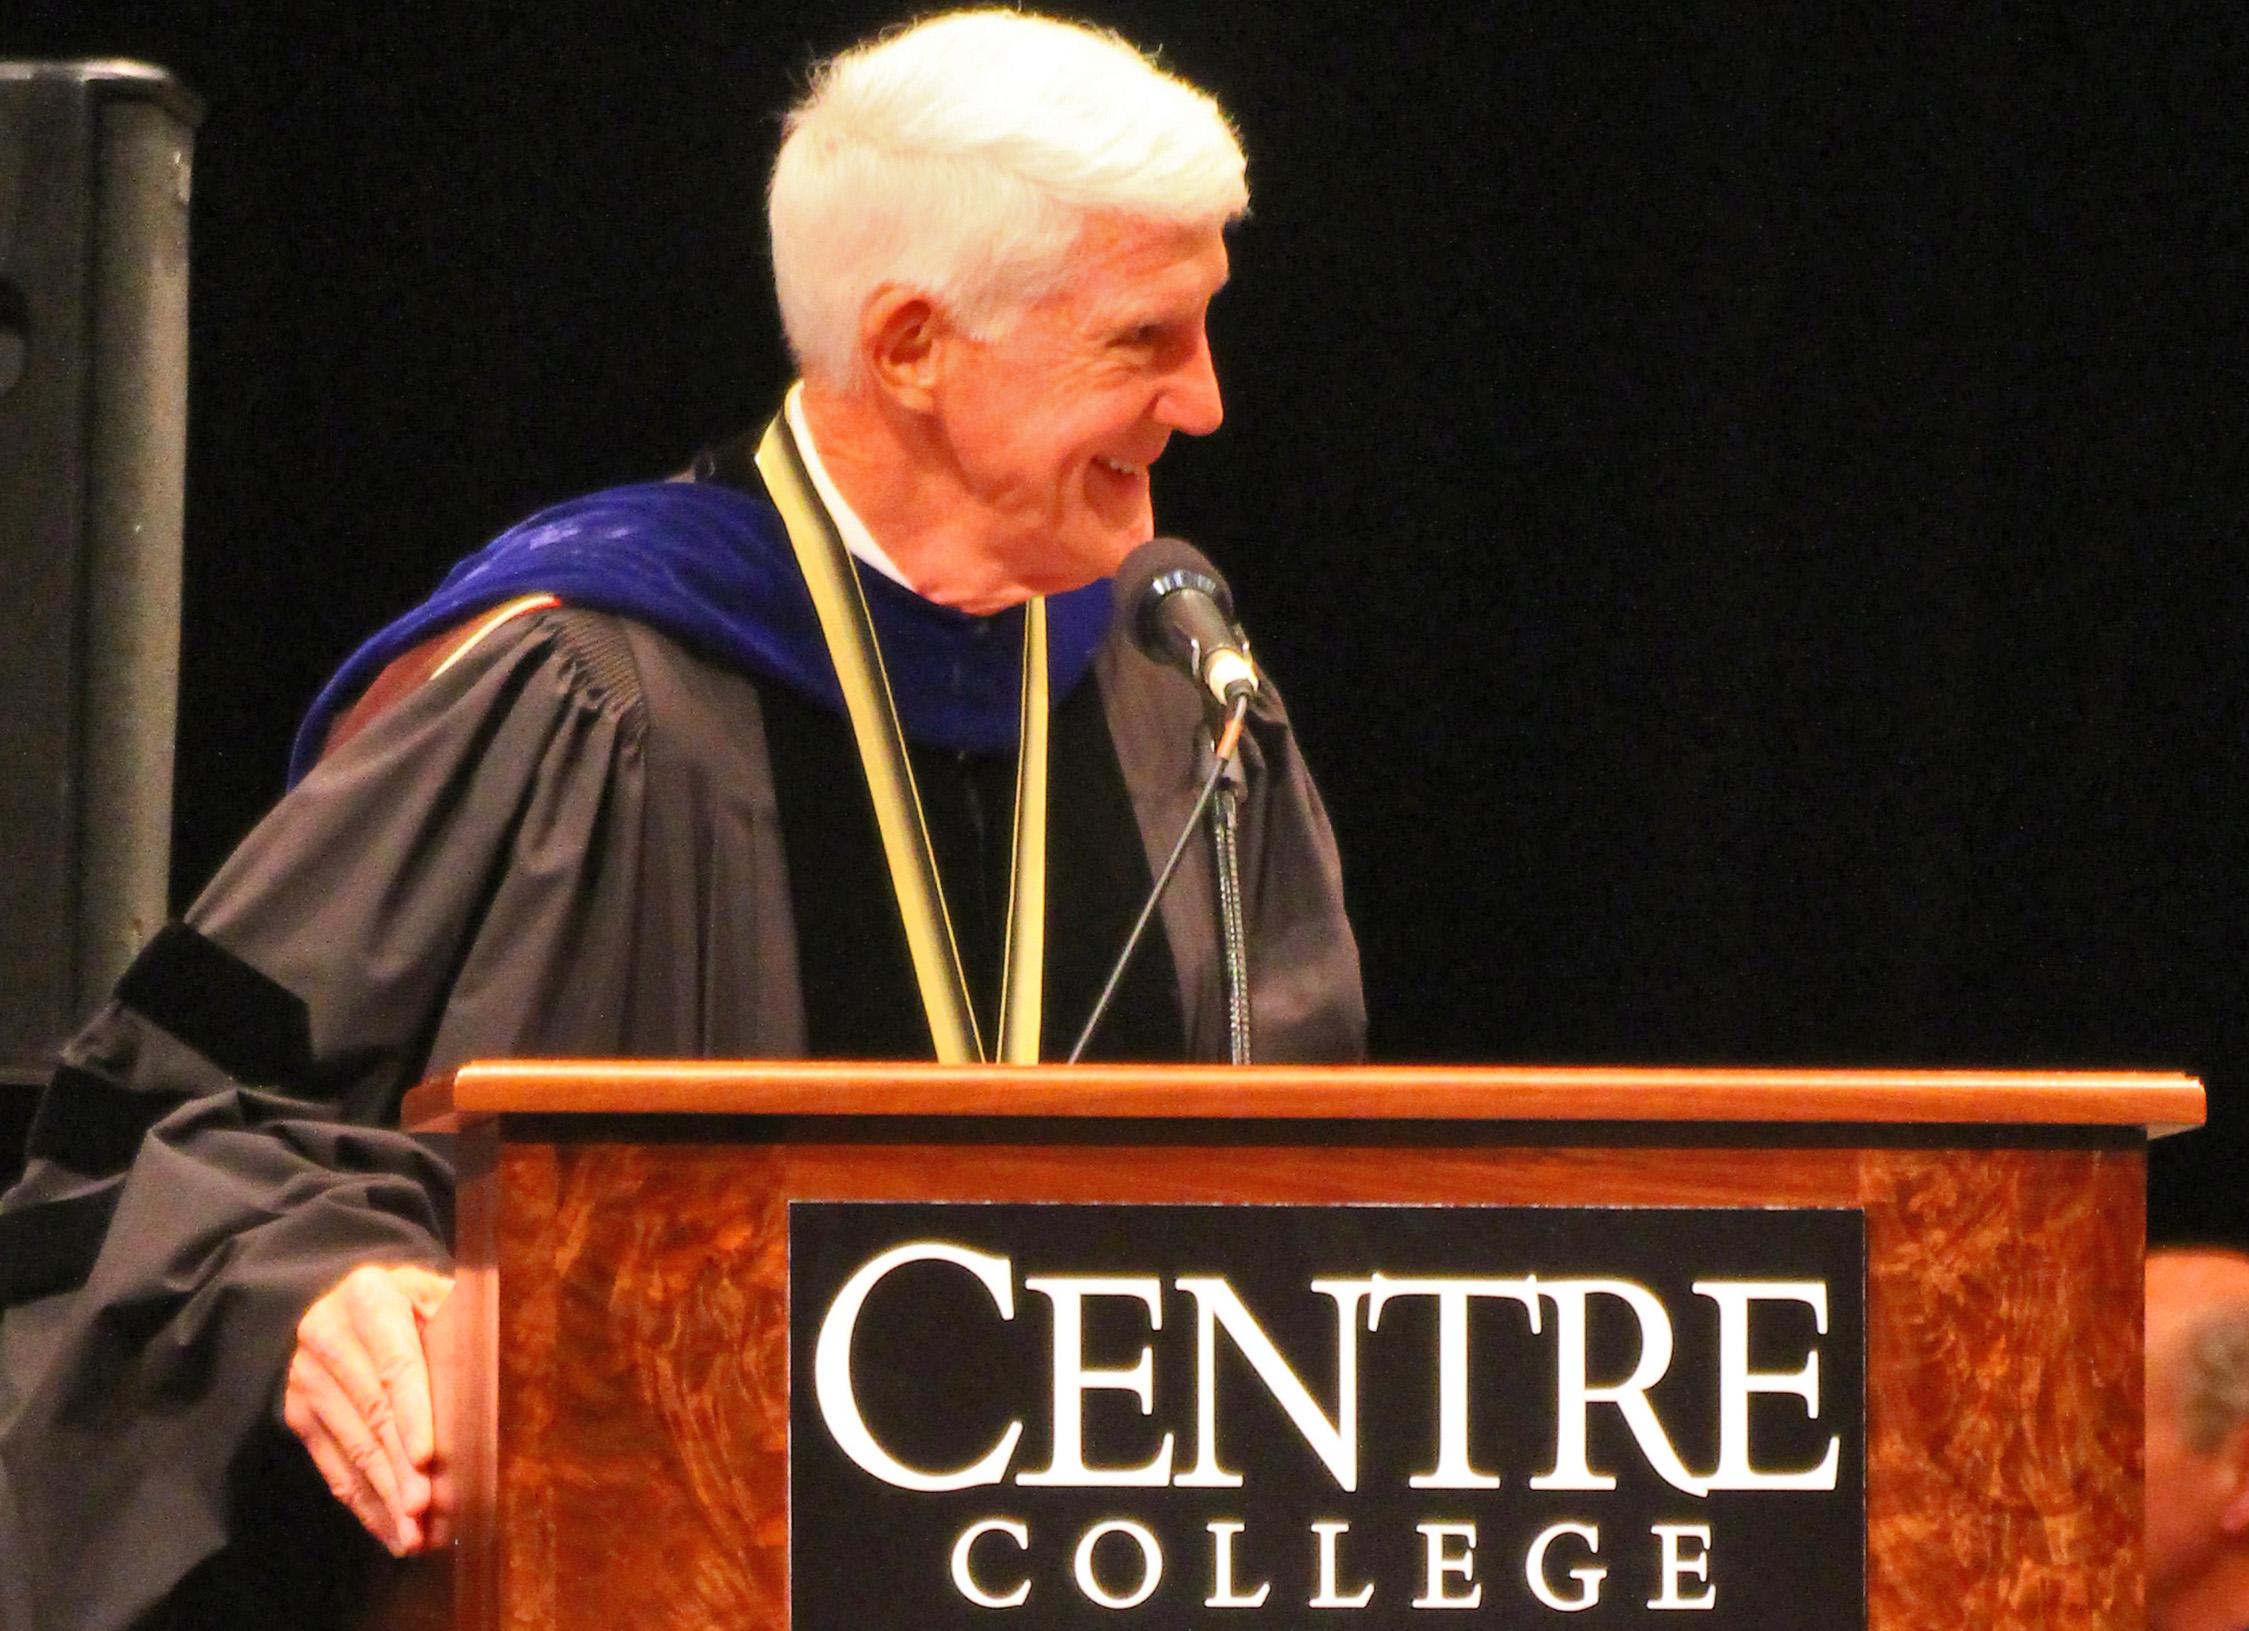 Centre President John Roush plans to retire next year - The  Advocate-Messenger | The Advocate-Messenger